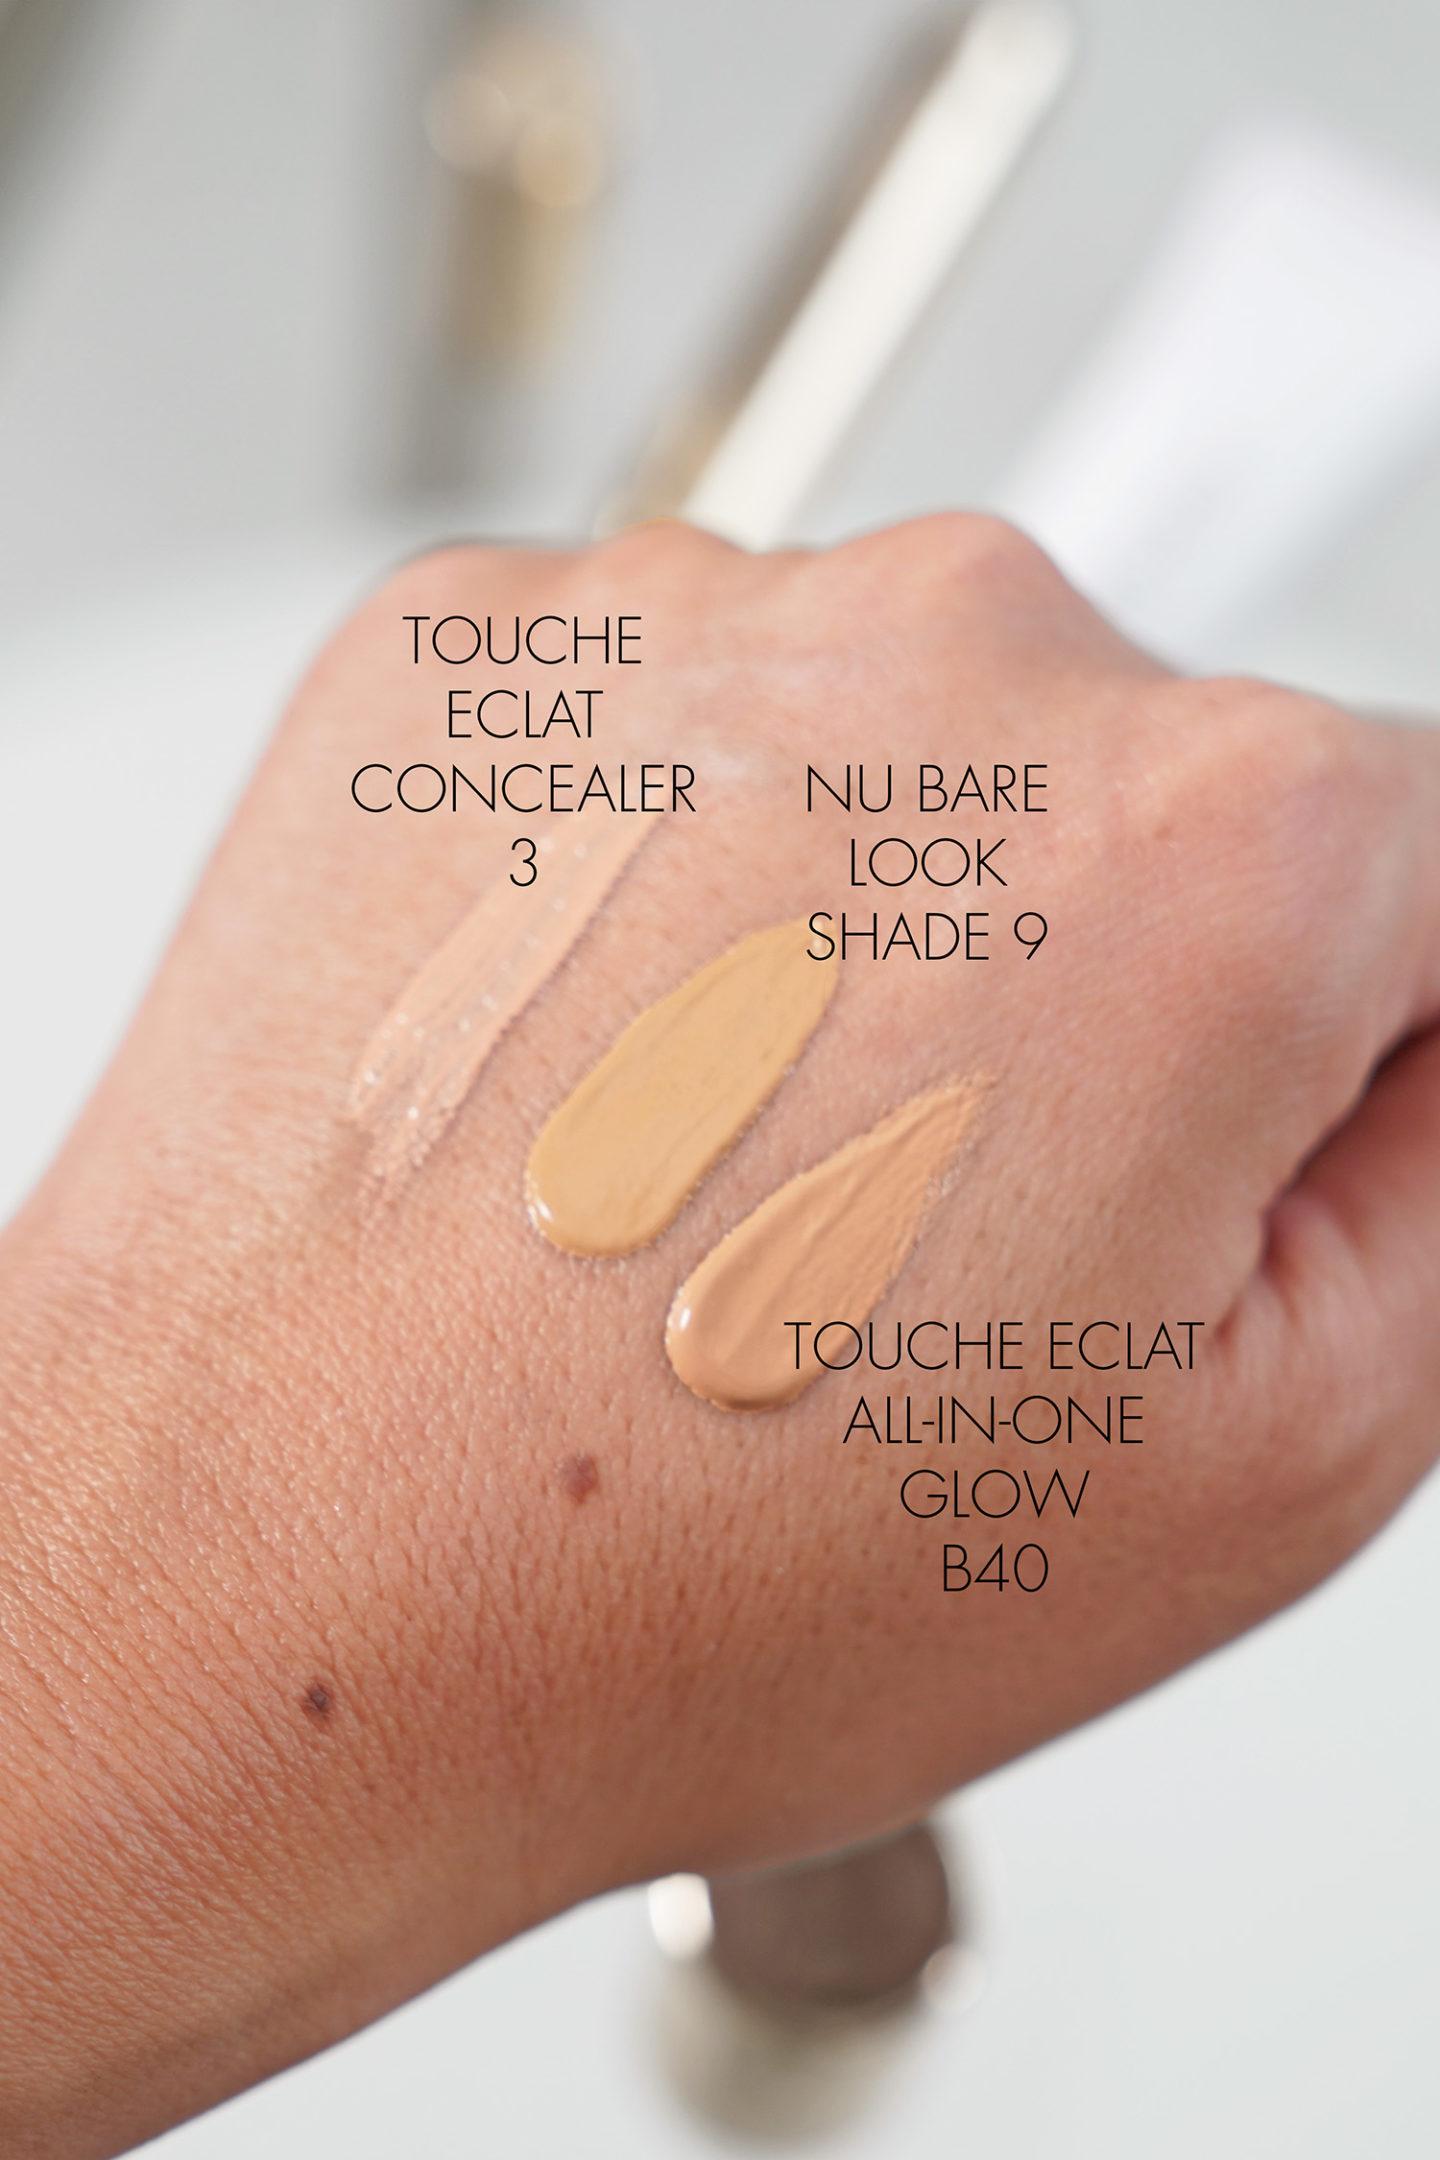 YSL Touche Eclat Concealer 3, NU Bare Look Tint 9, Nuancier Touche Eclat B40